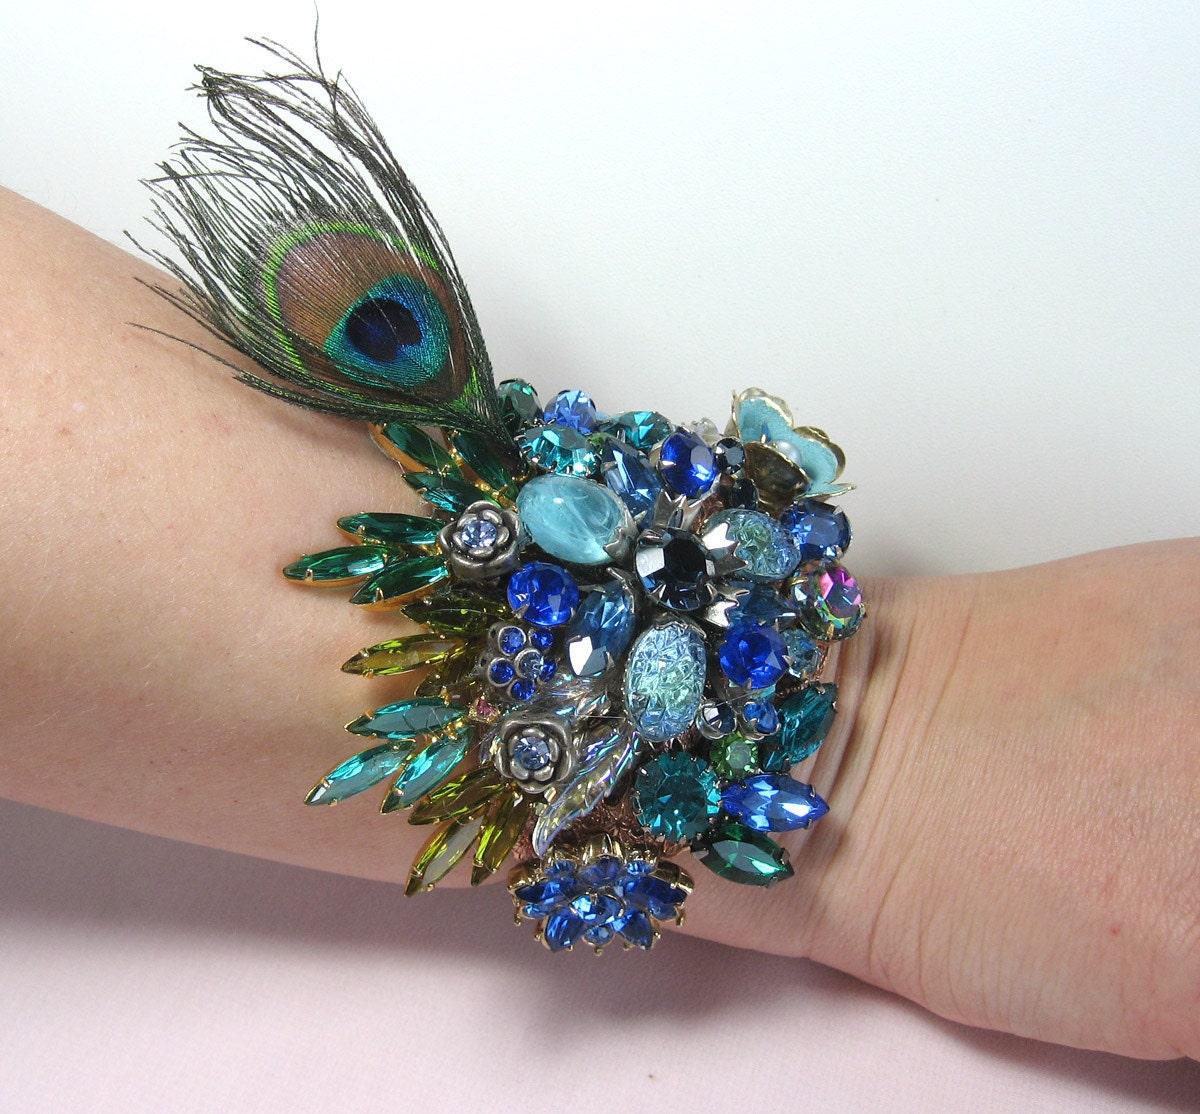 Peacock Wedding Ideas Etsy: Jeweled Peacock Wedding Bracelet Cuff From Vintage Jewels